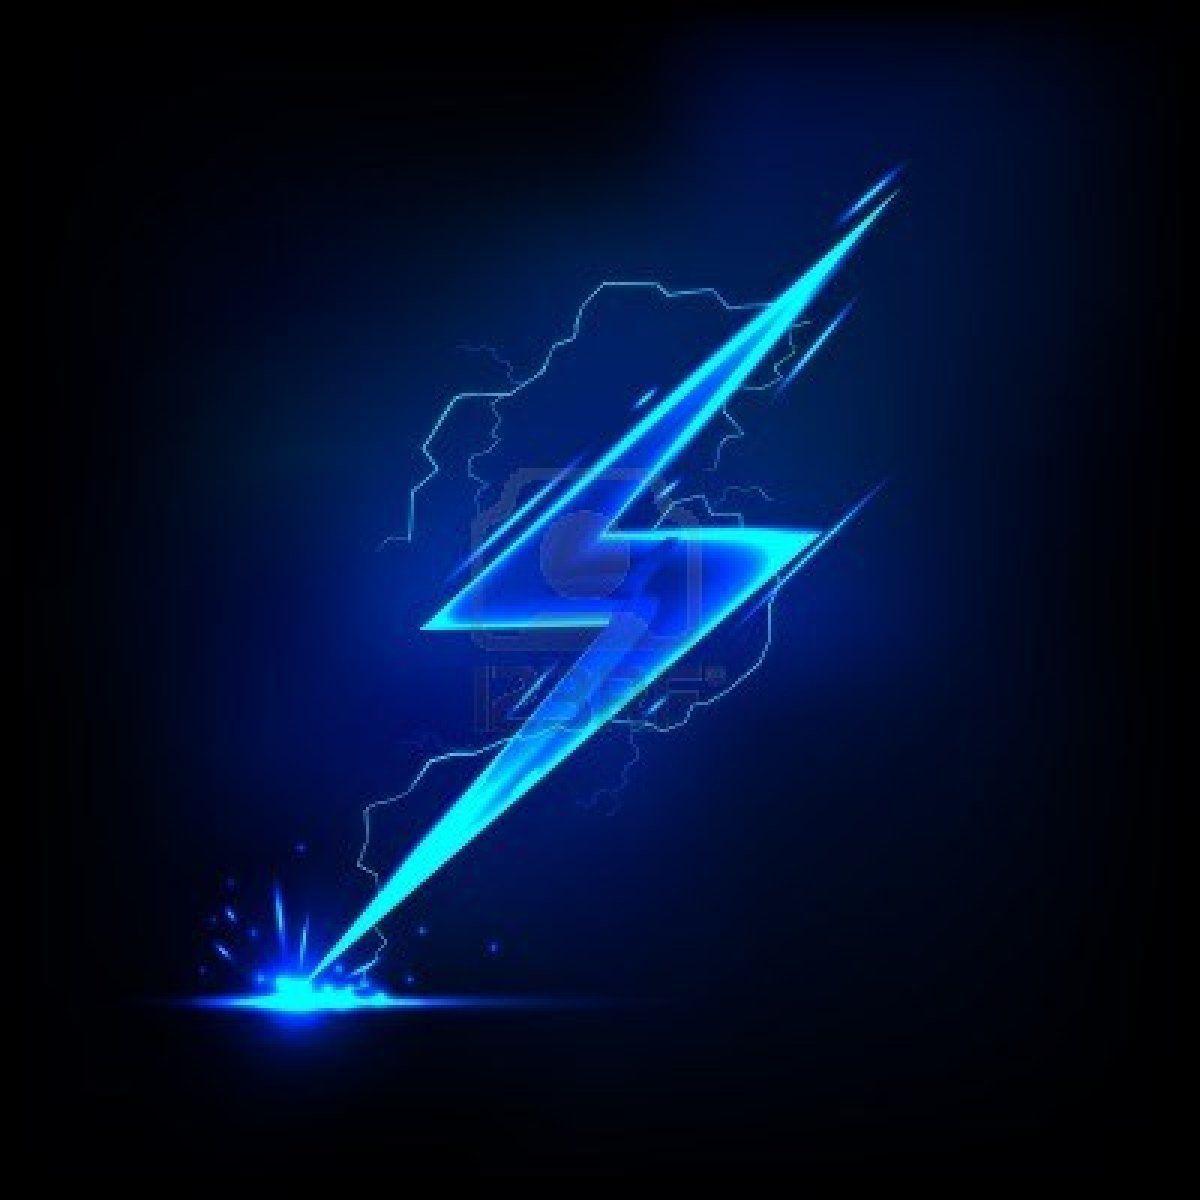 lightning art wallpaper - photo #31